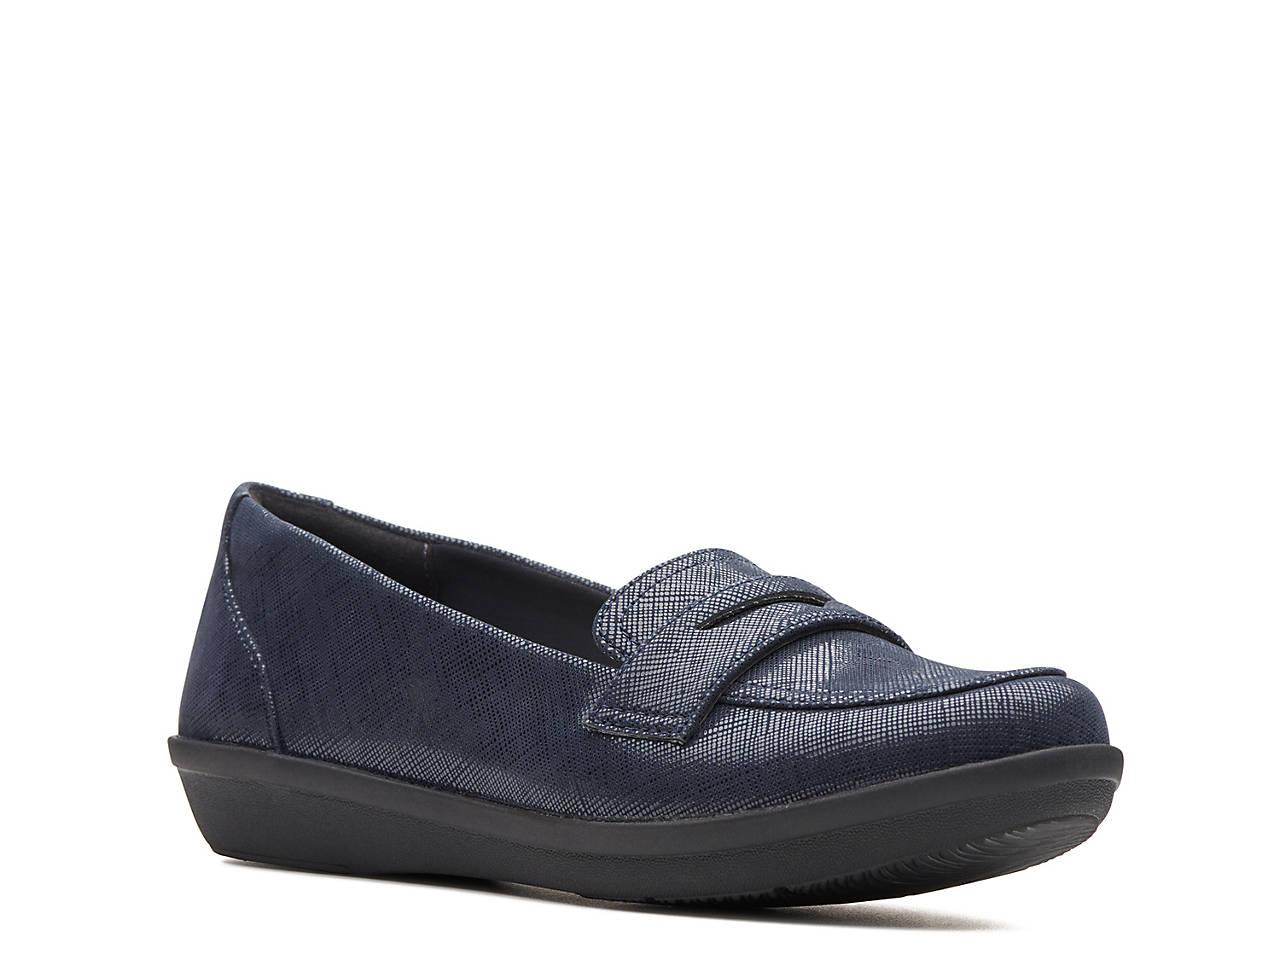 c8e365e7490 Clarks Ayla Form Penny Loafer Women s Shoes